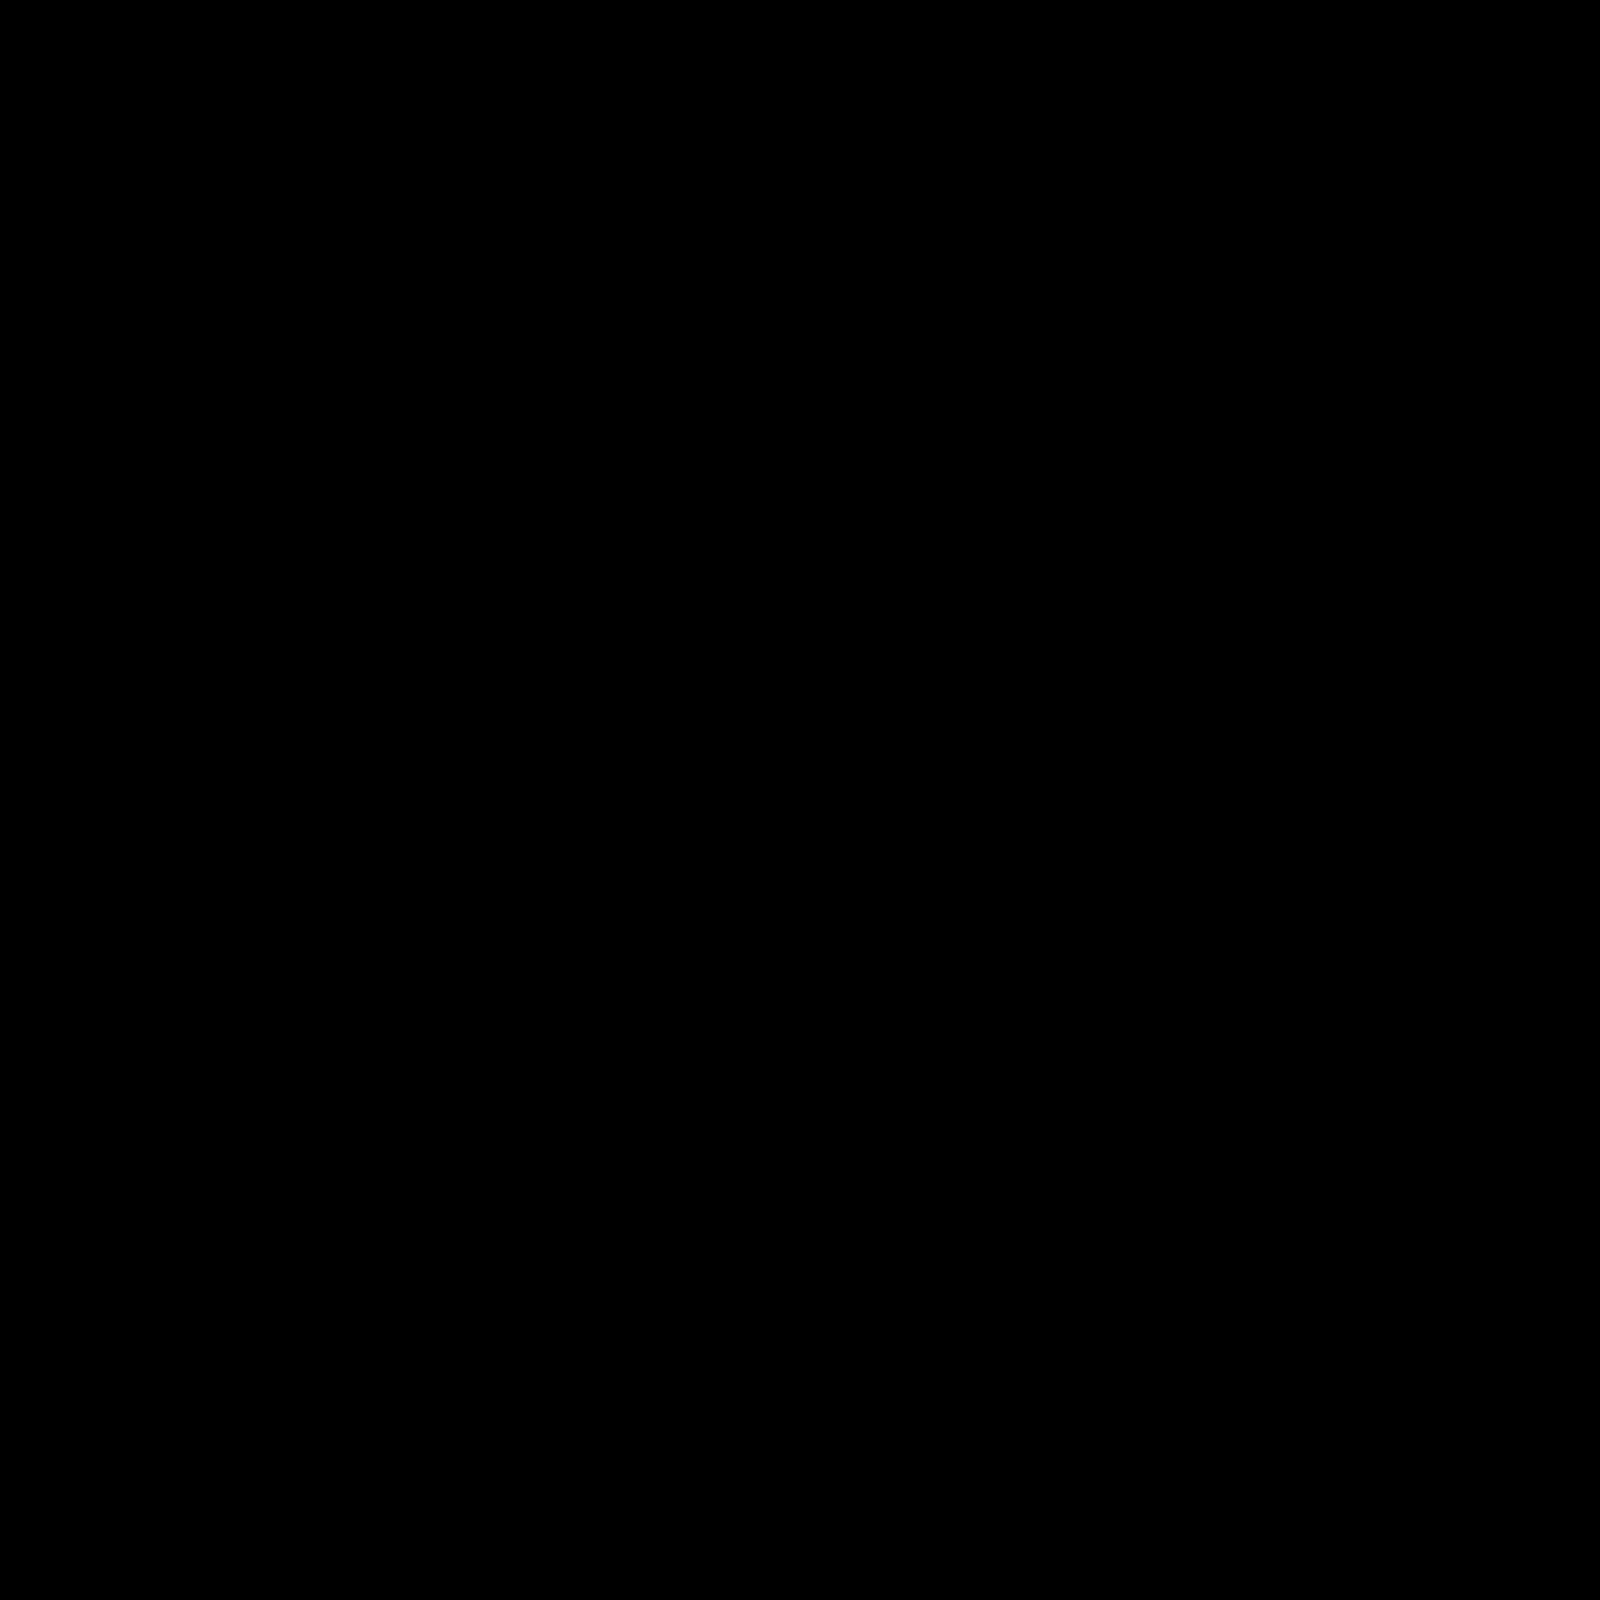 Flip Vertical icon